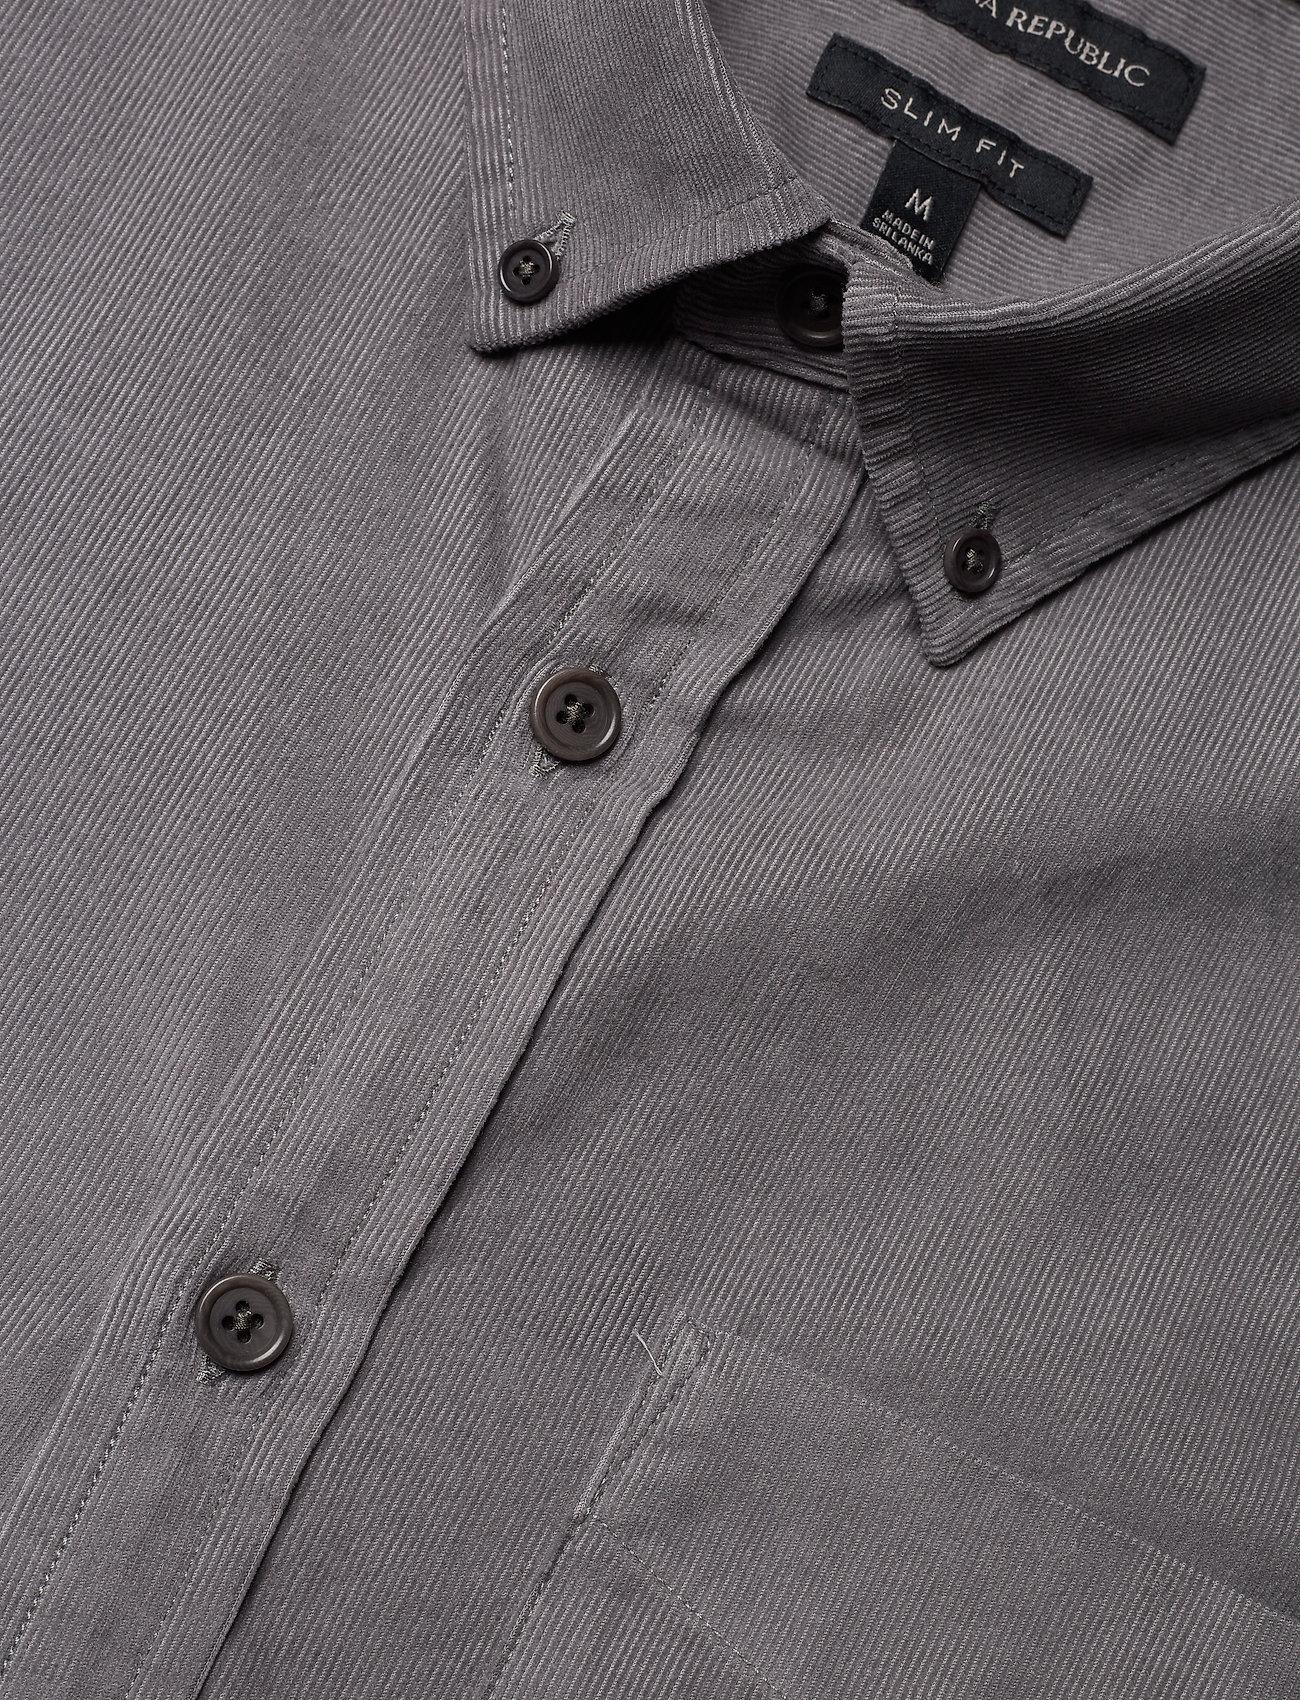 Banana Republic Slim-Fit Corduroy Shirt - Skjorter ROCK GREY - Menn Klær